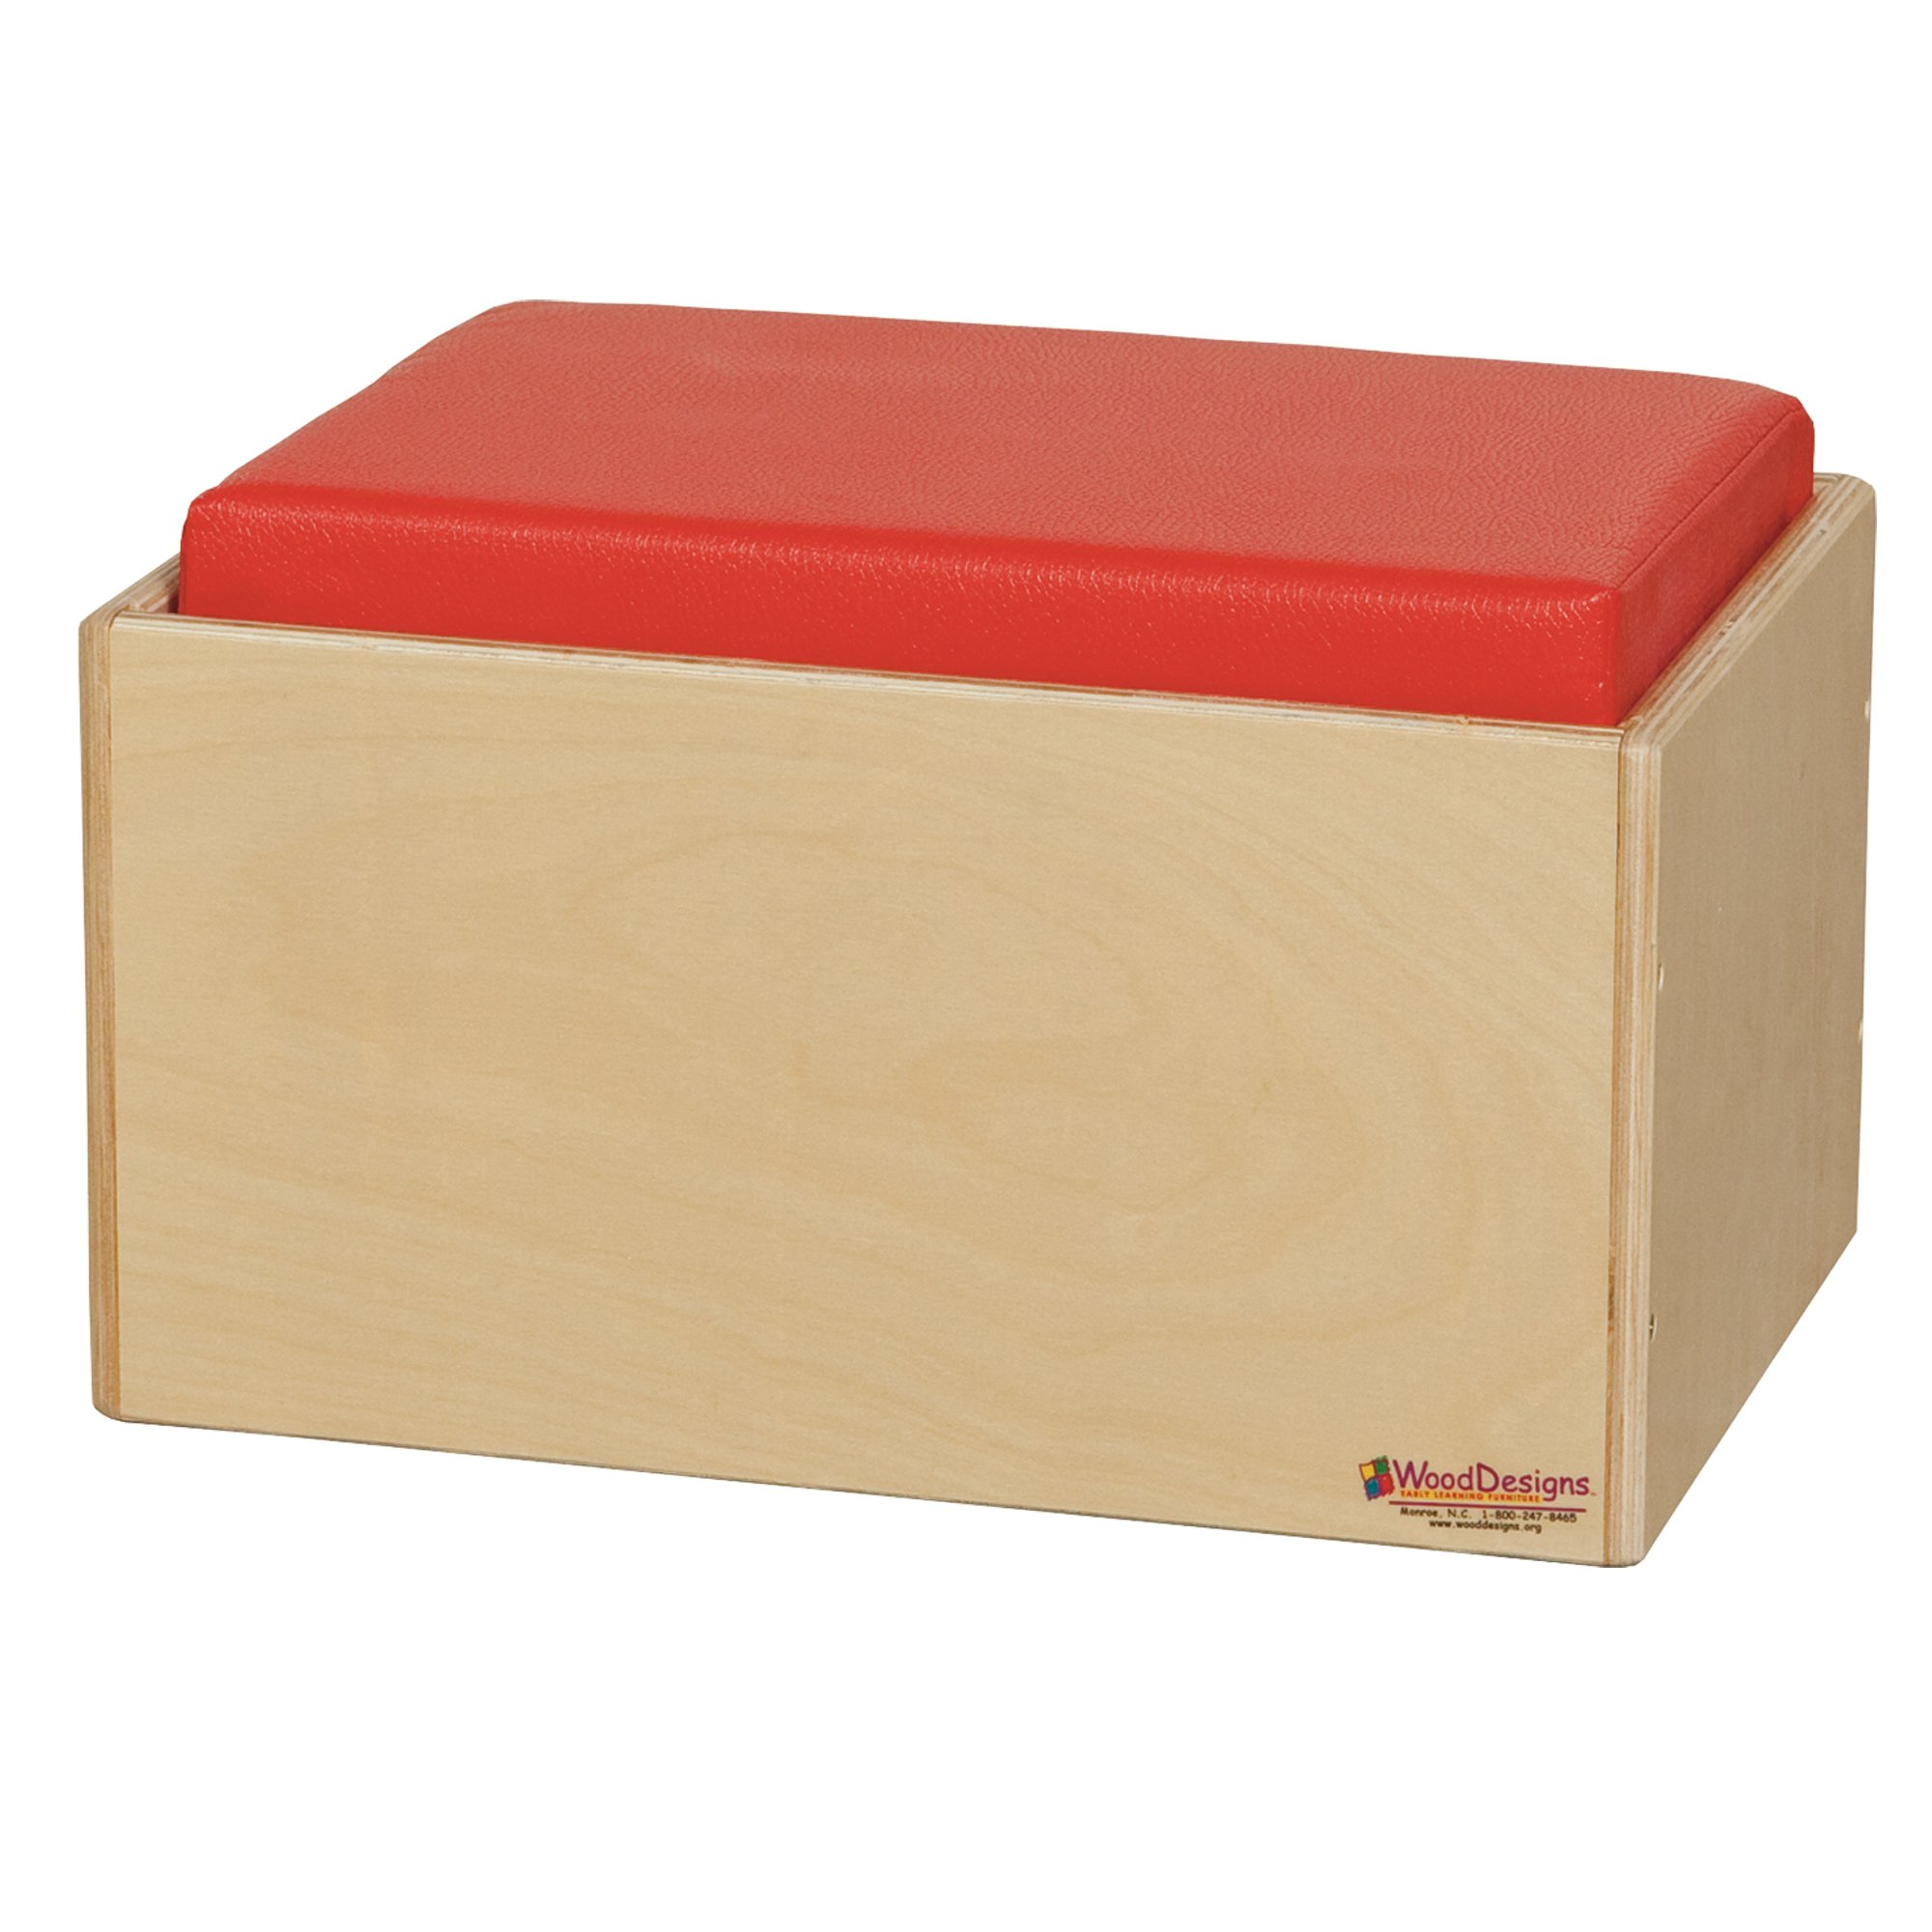 Wood Designs WD31700 Single Bench